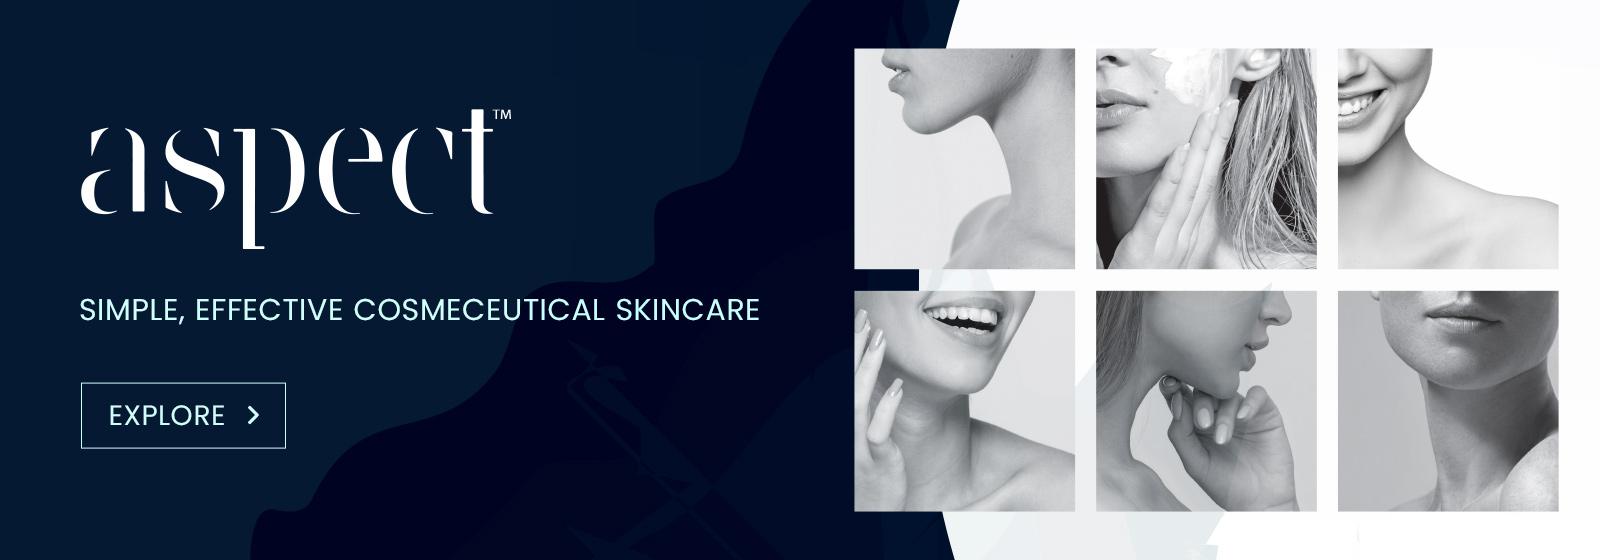 New Aspect Skincare - Catwalk Hair & Beauty Store Australia